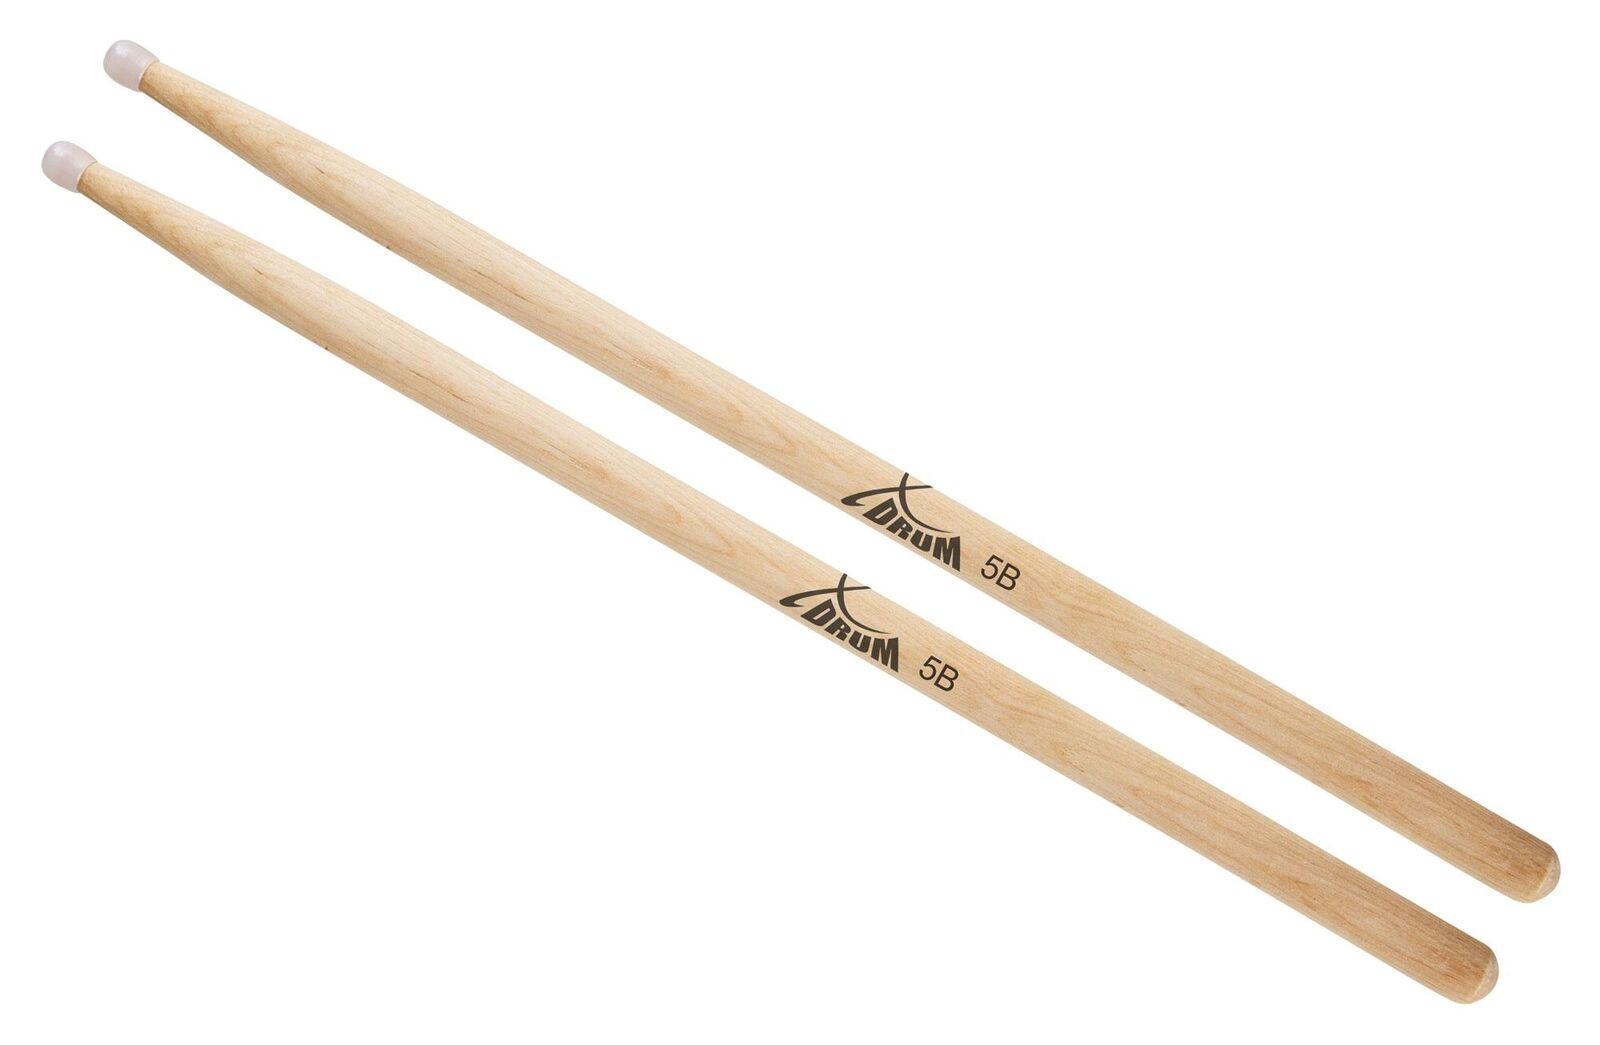 2pcs Ahorn Holz Drumsticks 5A Trommelstöcke Schlagzeug Instrumente Teile #JT1